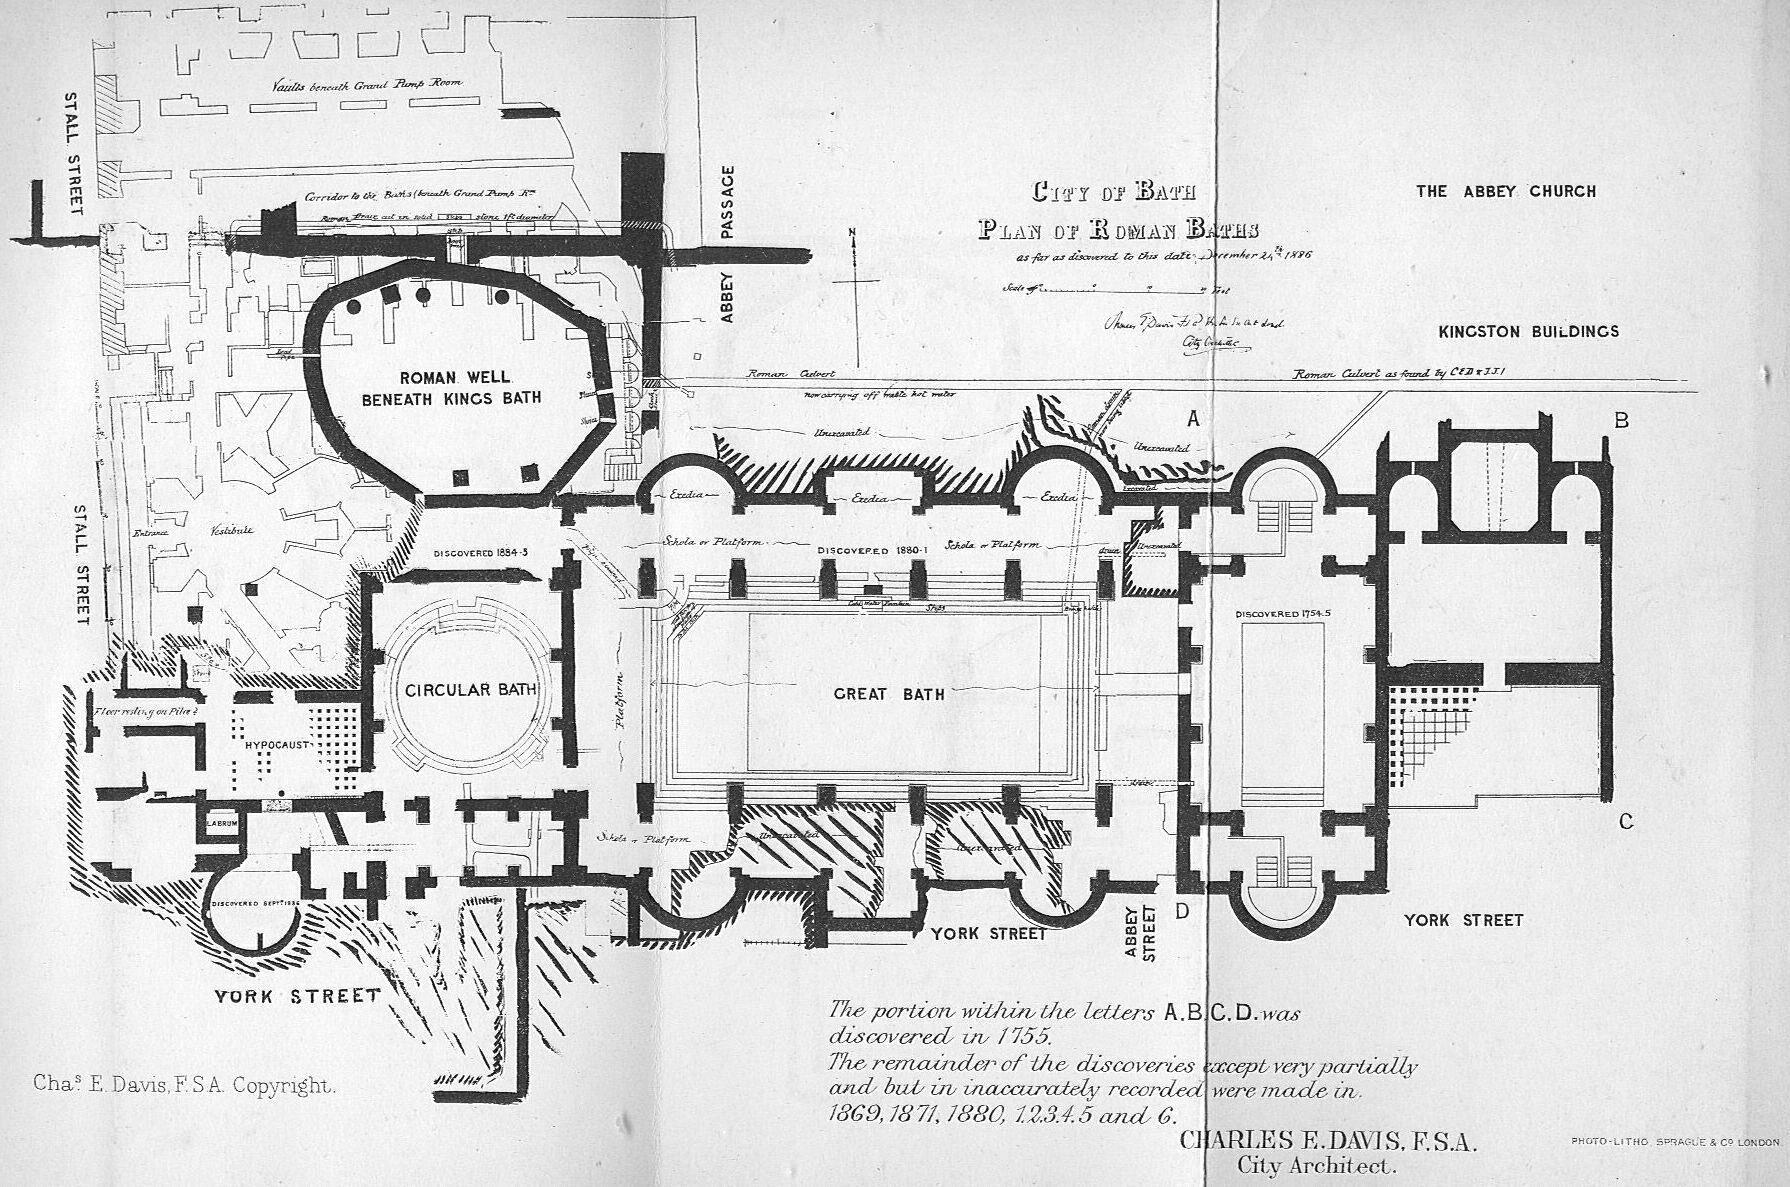 hight resolution of bedroom house floor plans ancient roman bath house floor plan from roman bath house floor plan image source futurehorizons us